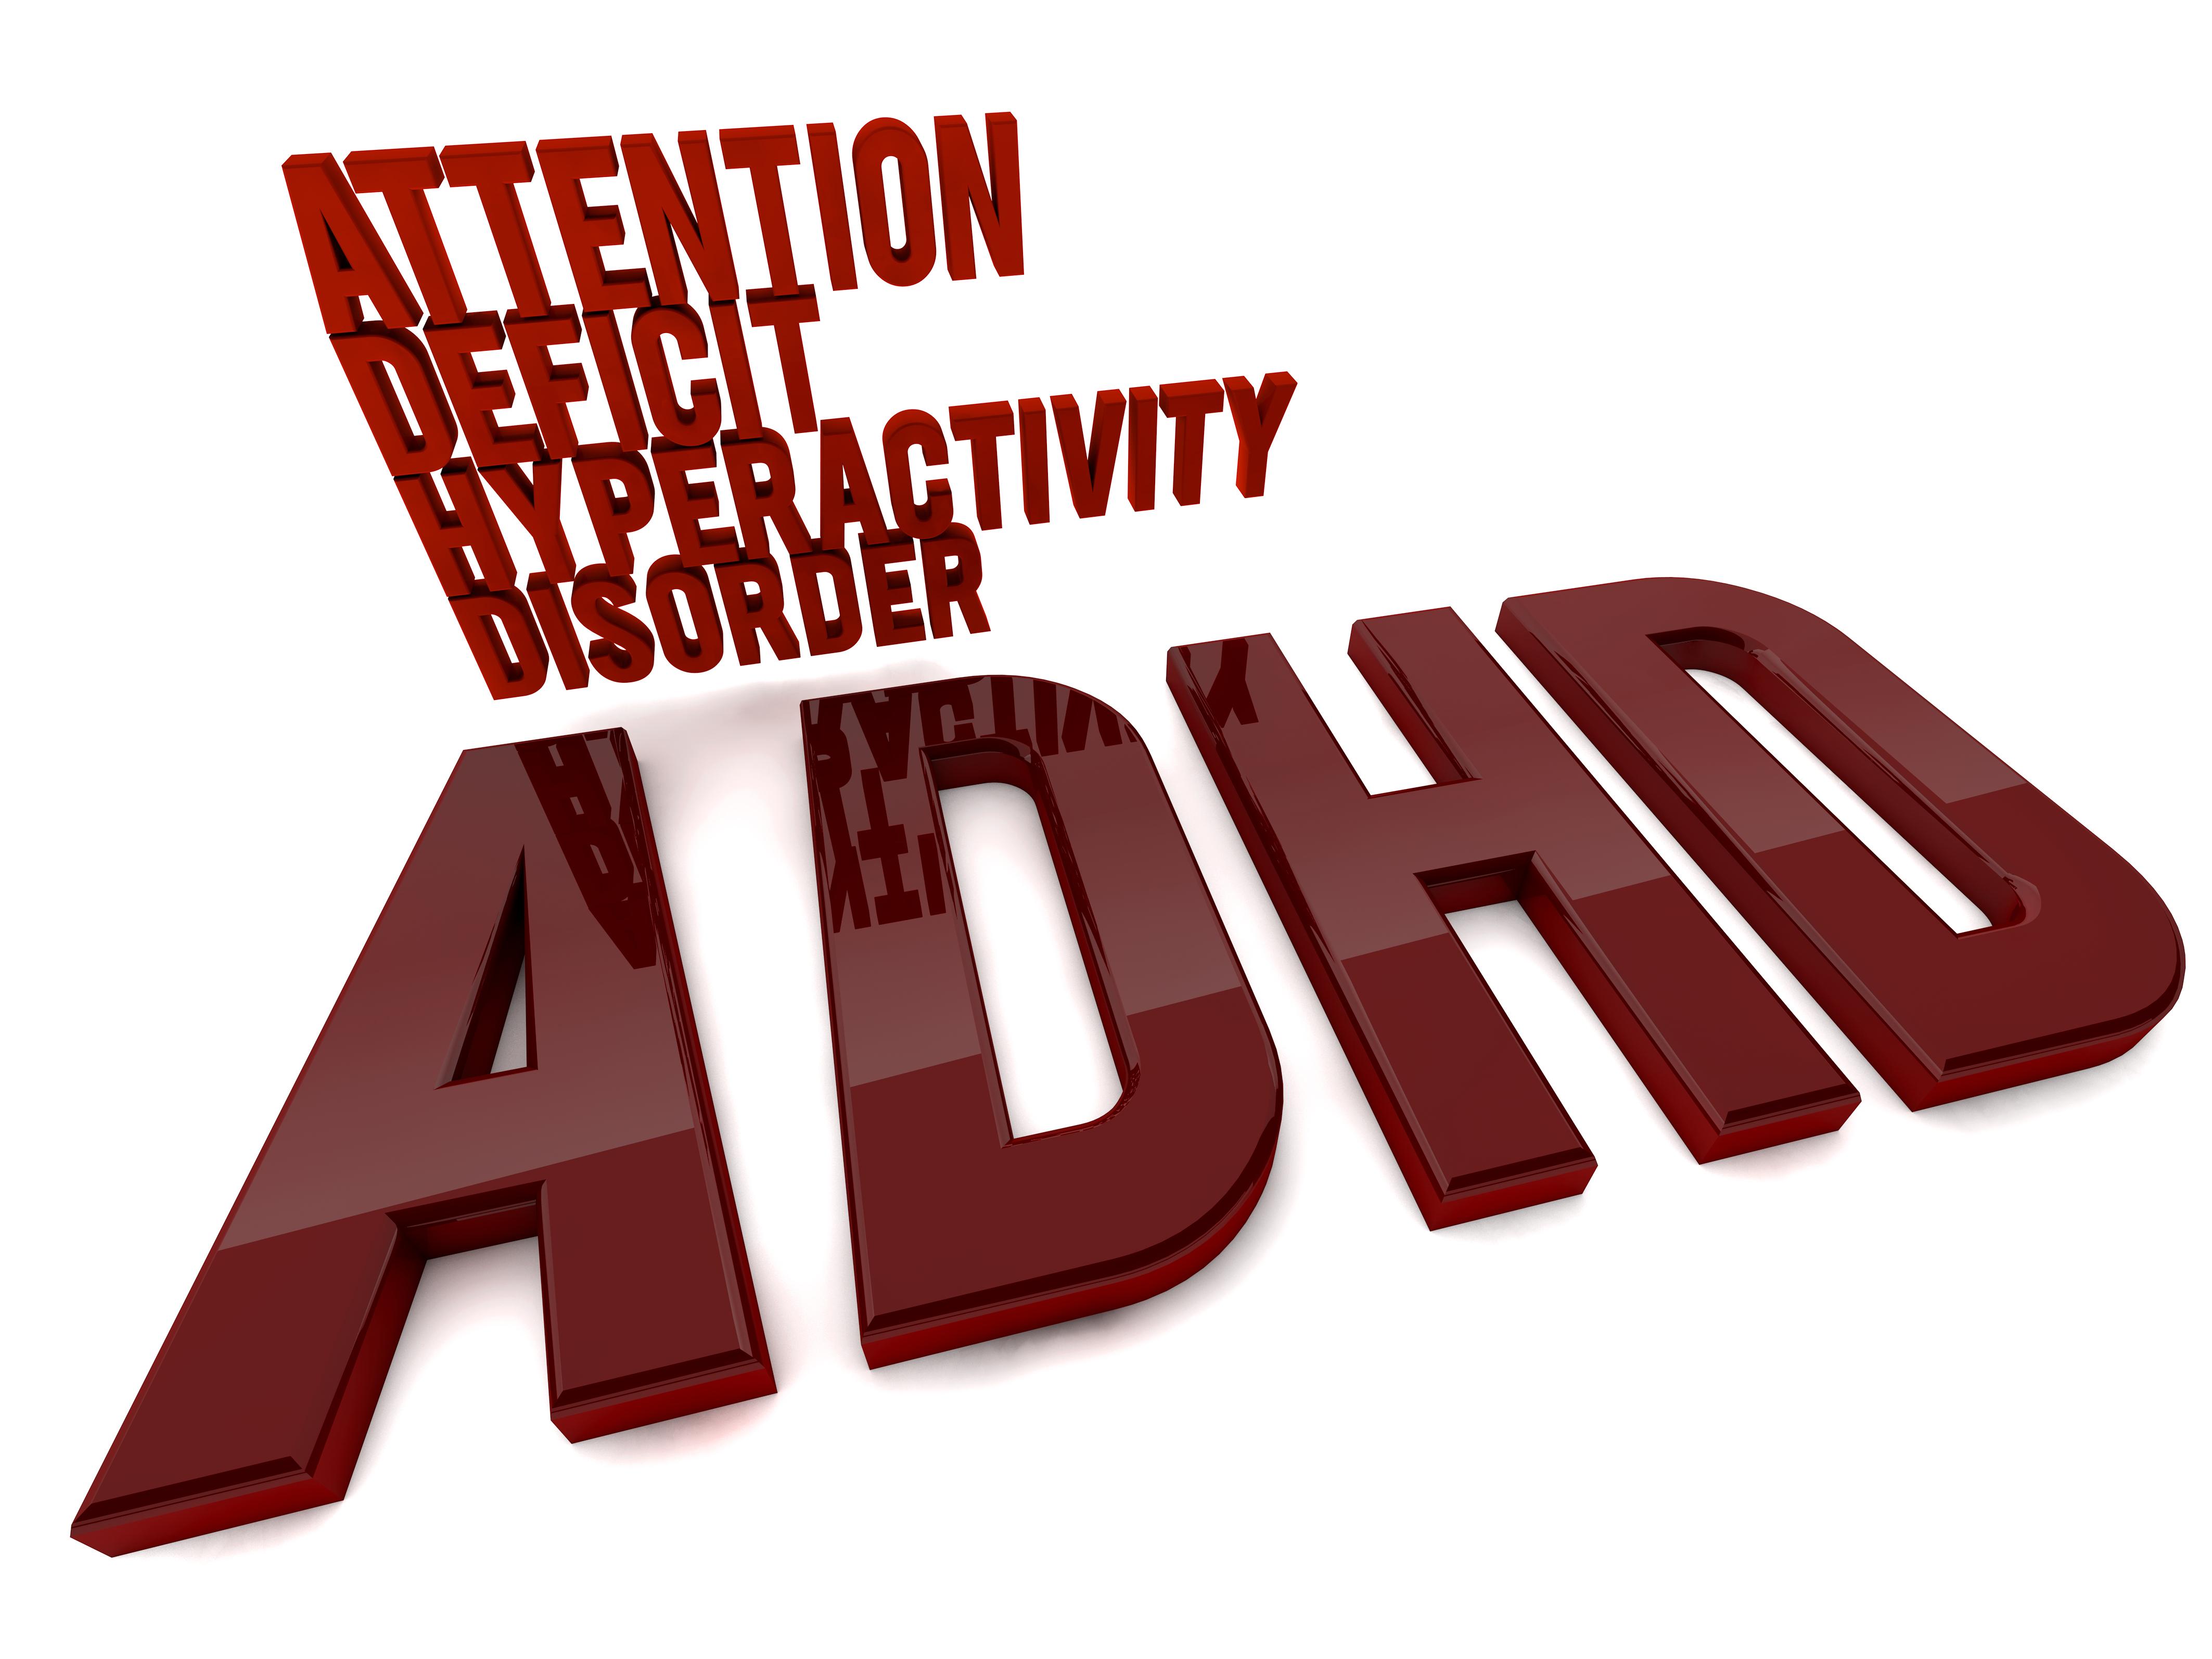 adhd-sign